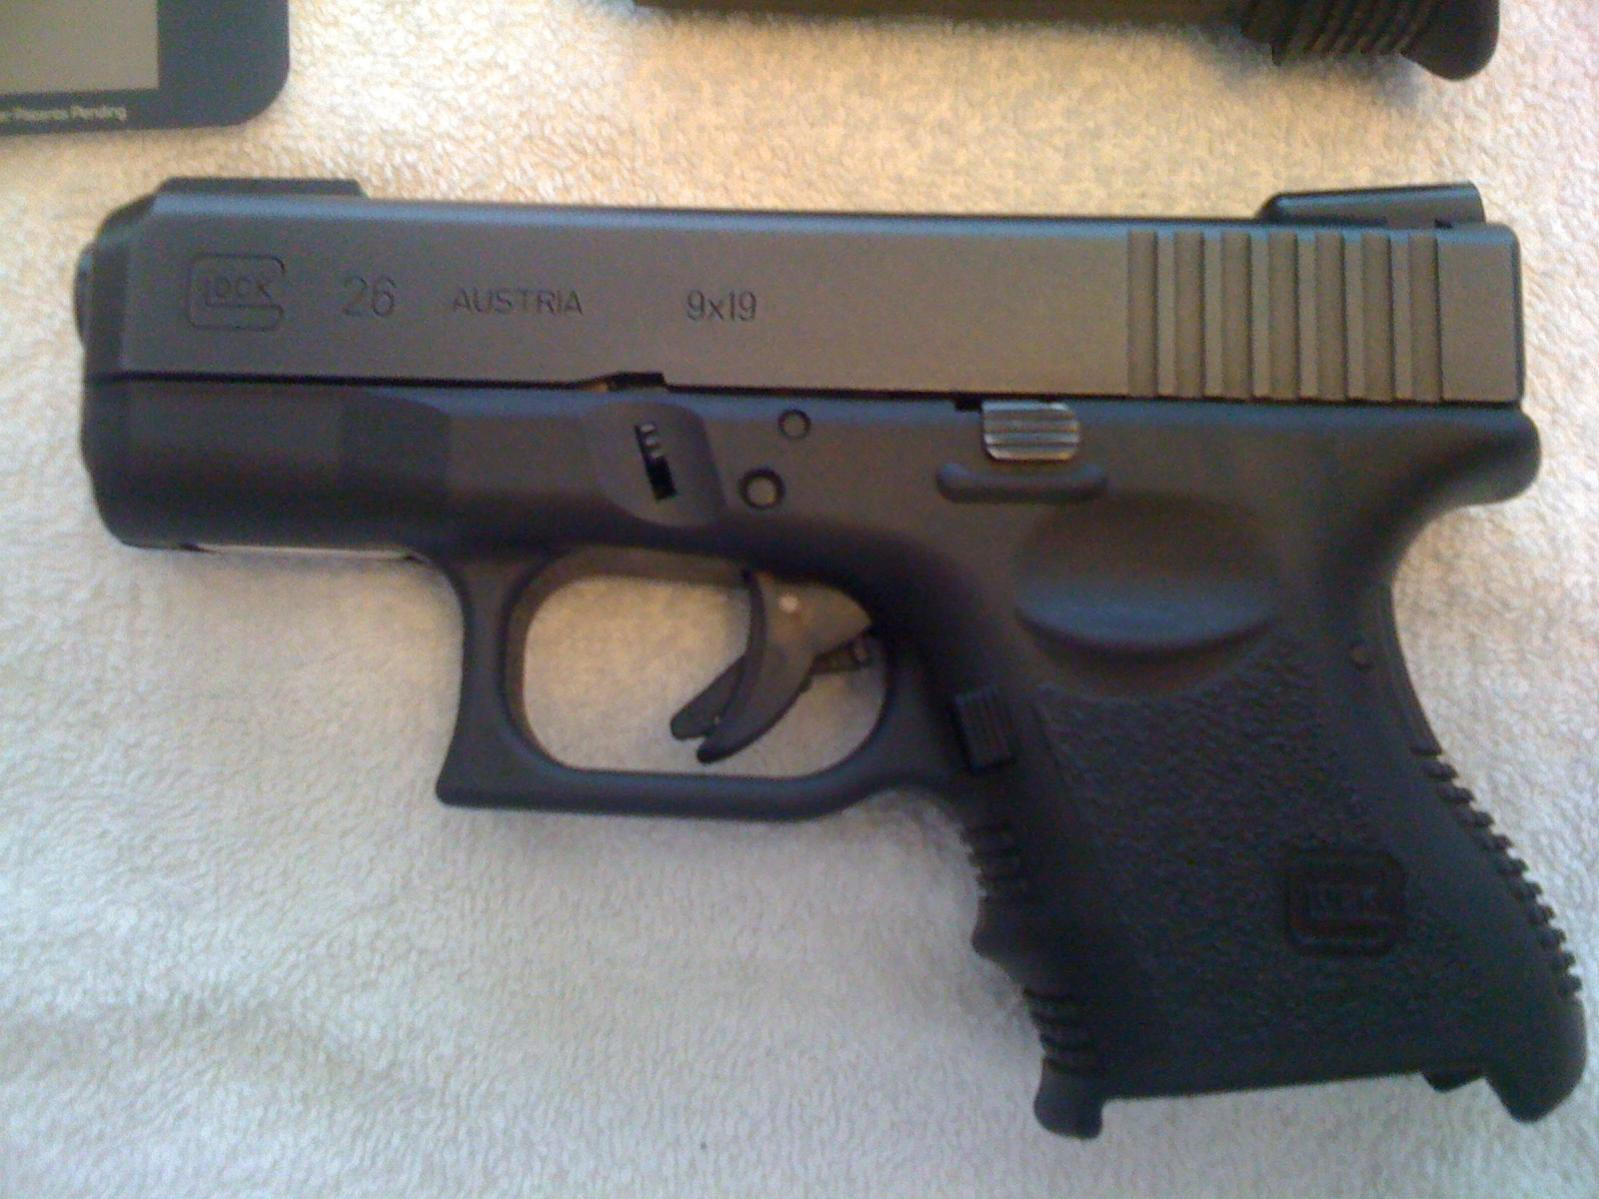 Another glock!!!-photo.jpg